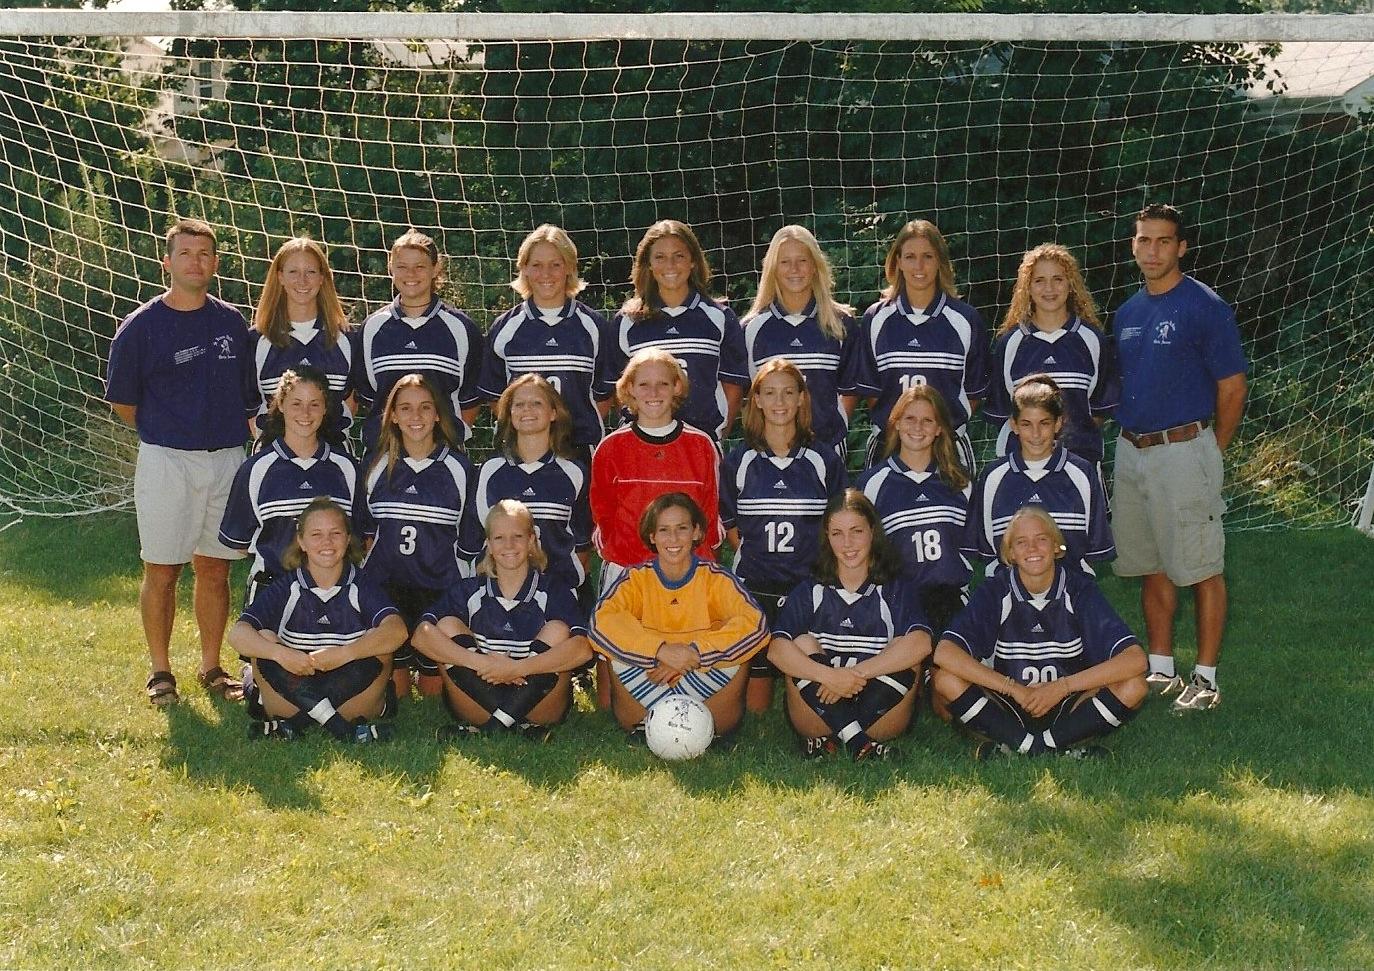 2000 Division-I Regional Champions